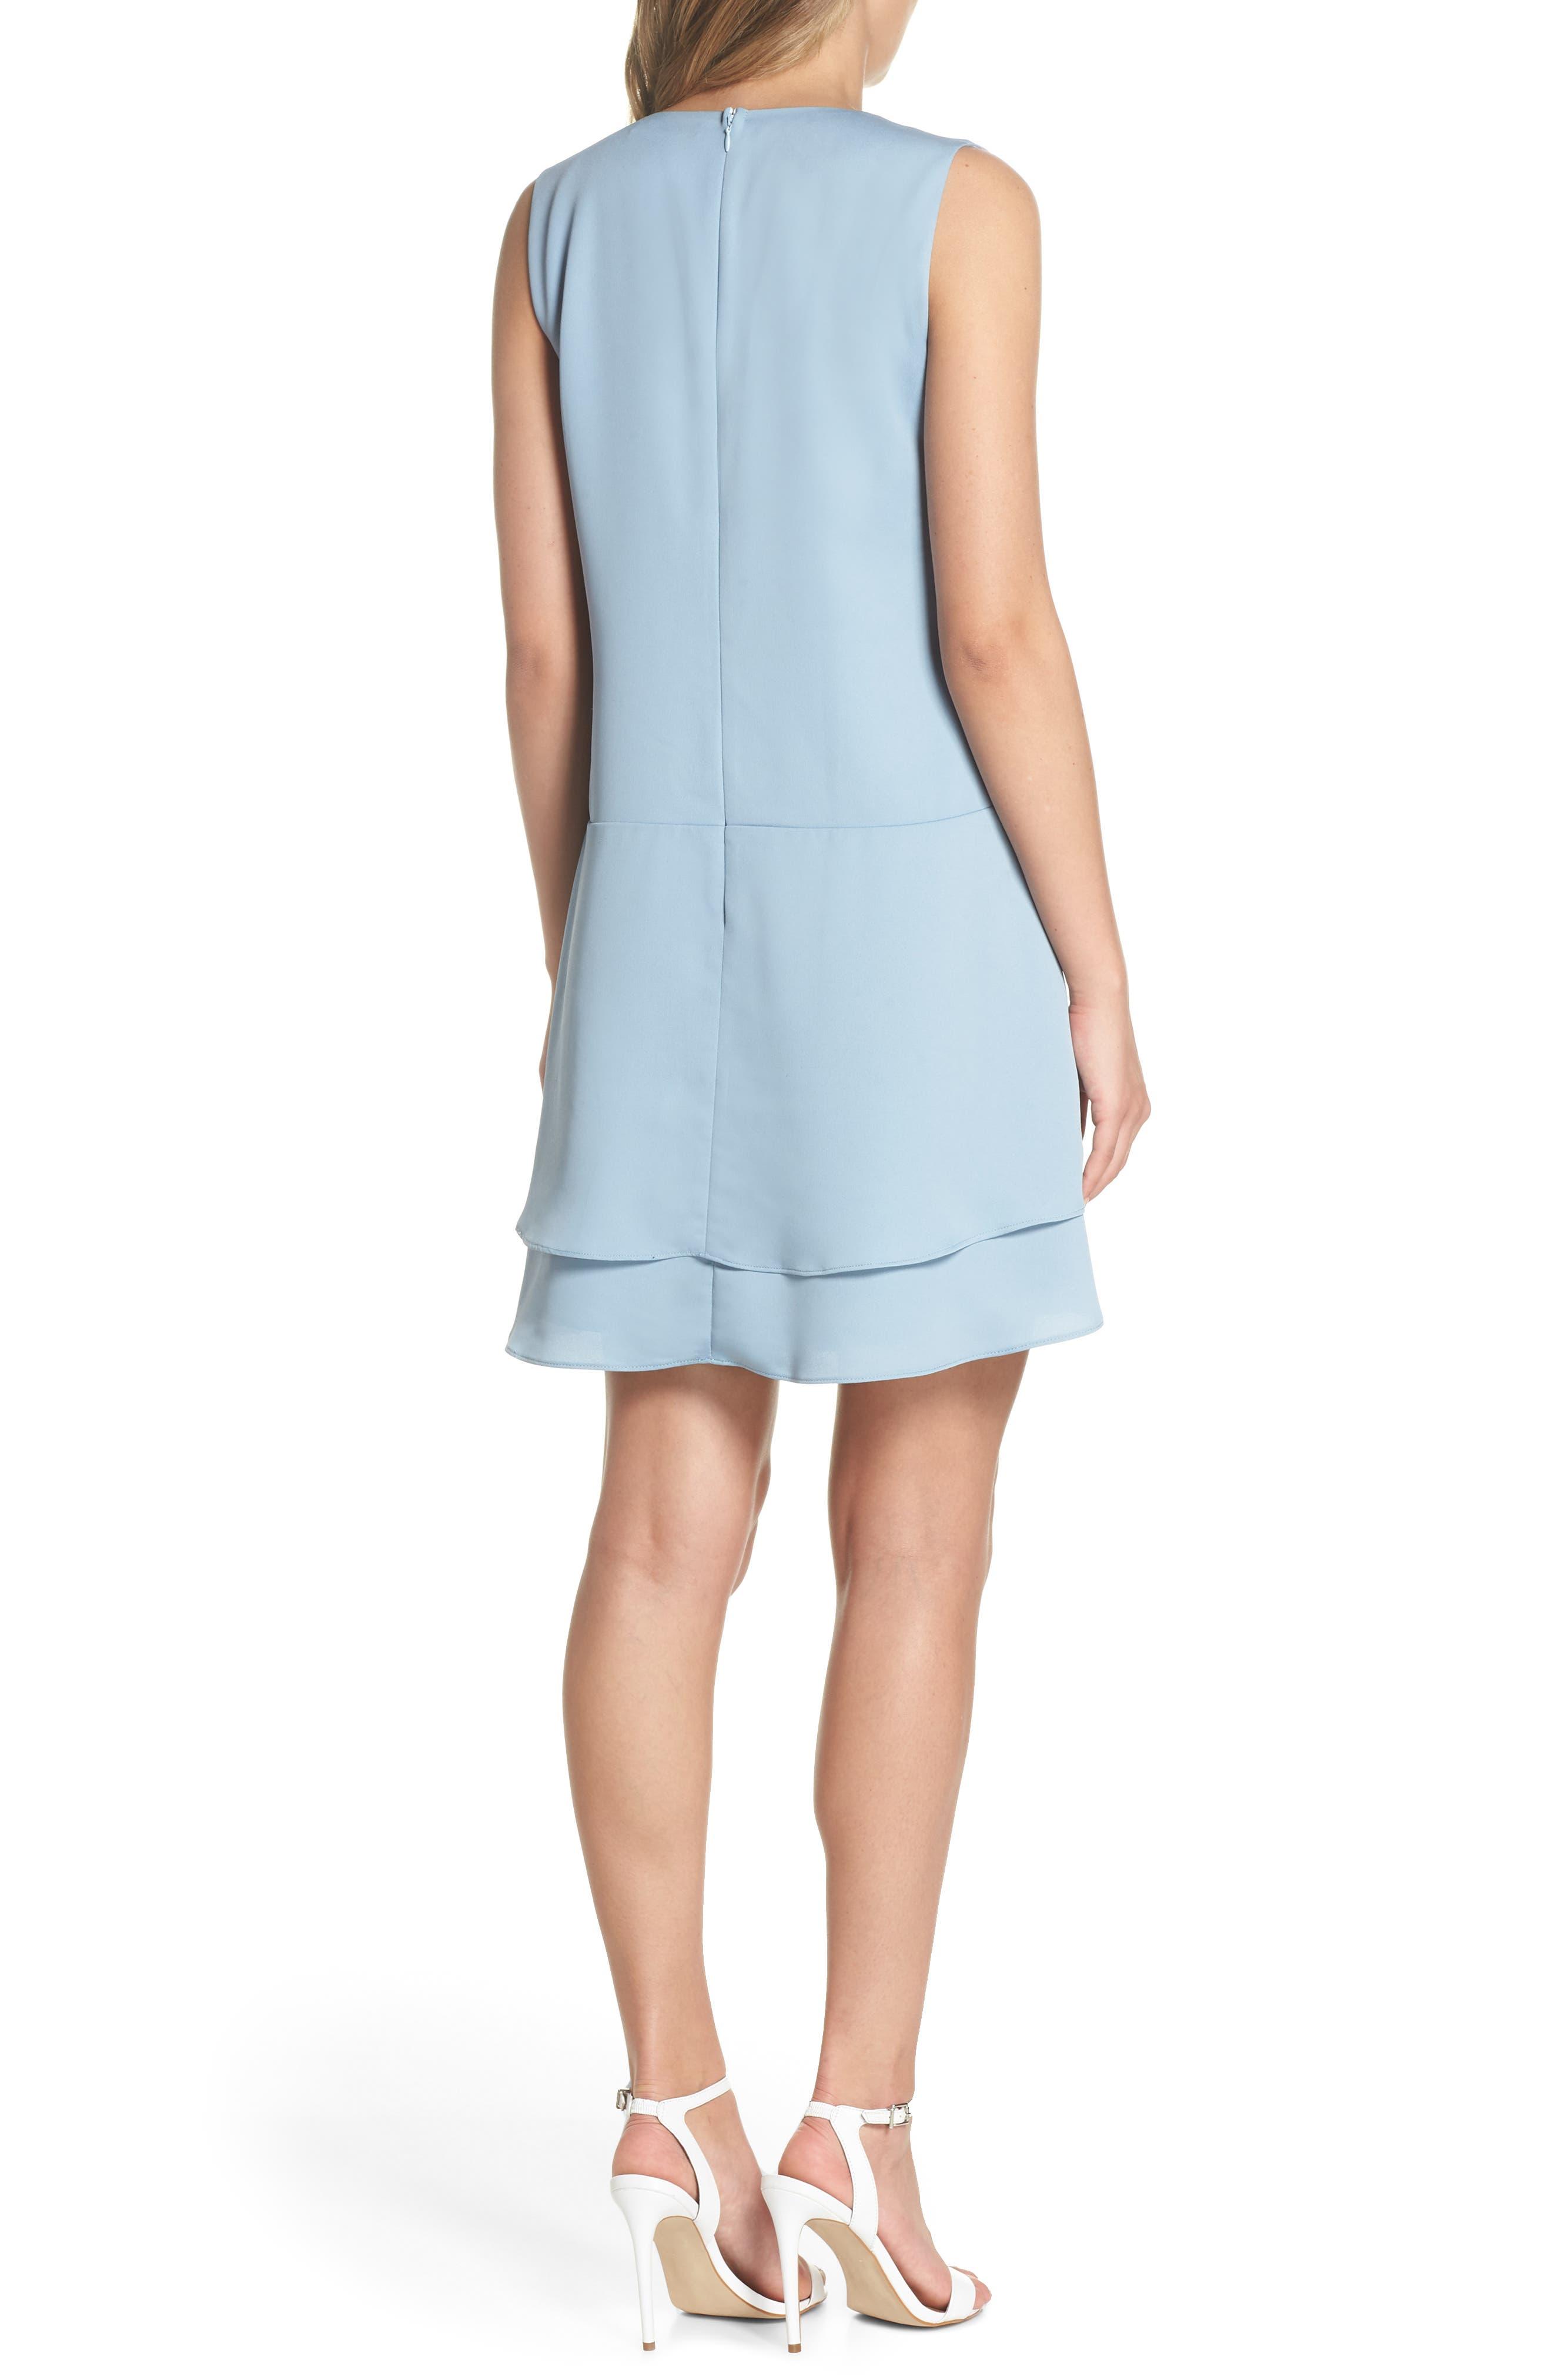 Florence V-Neck Minidress,                             Alternate thumbnail 2, color,                             Allure Blue